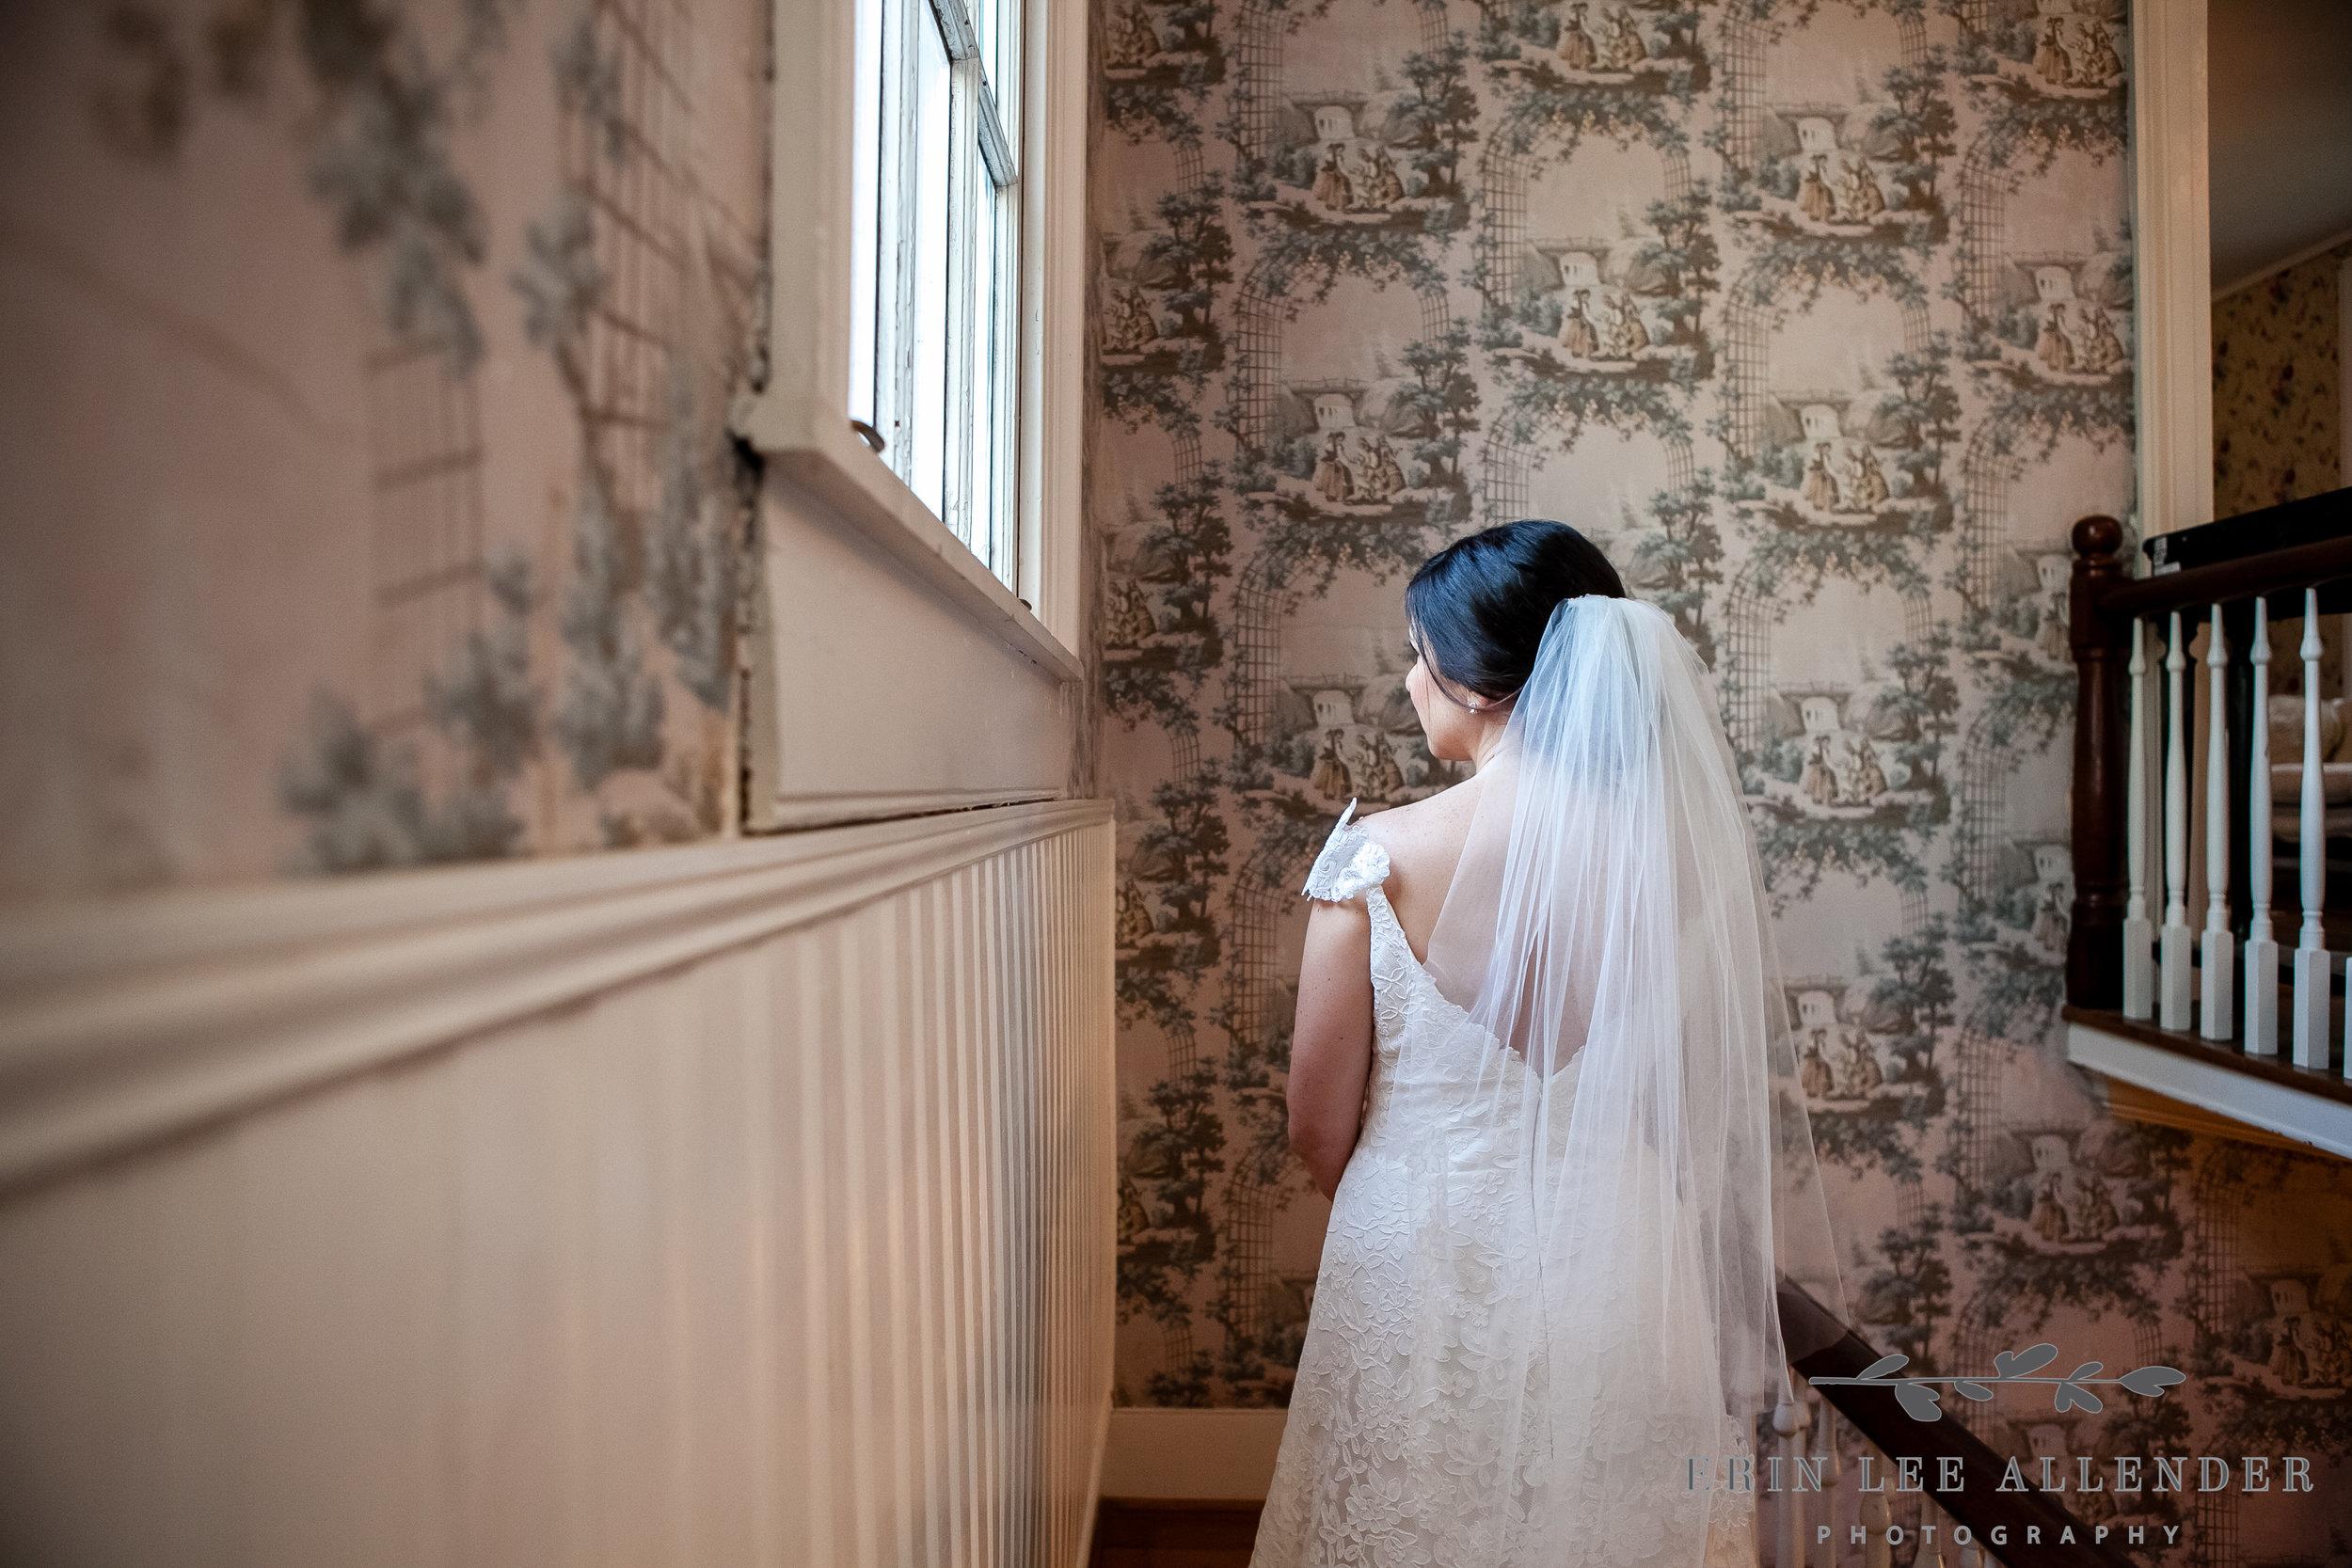 Brides_Veil_Vintage_Wallpaper